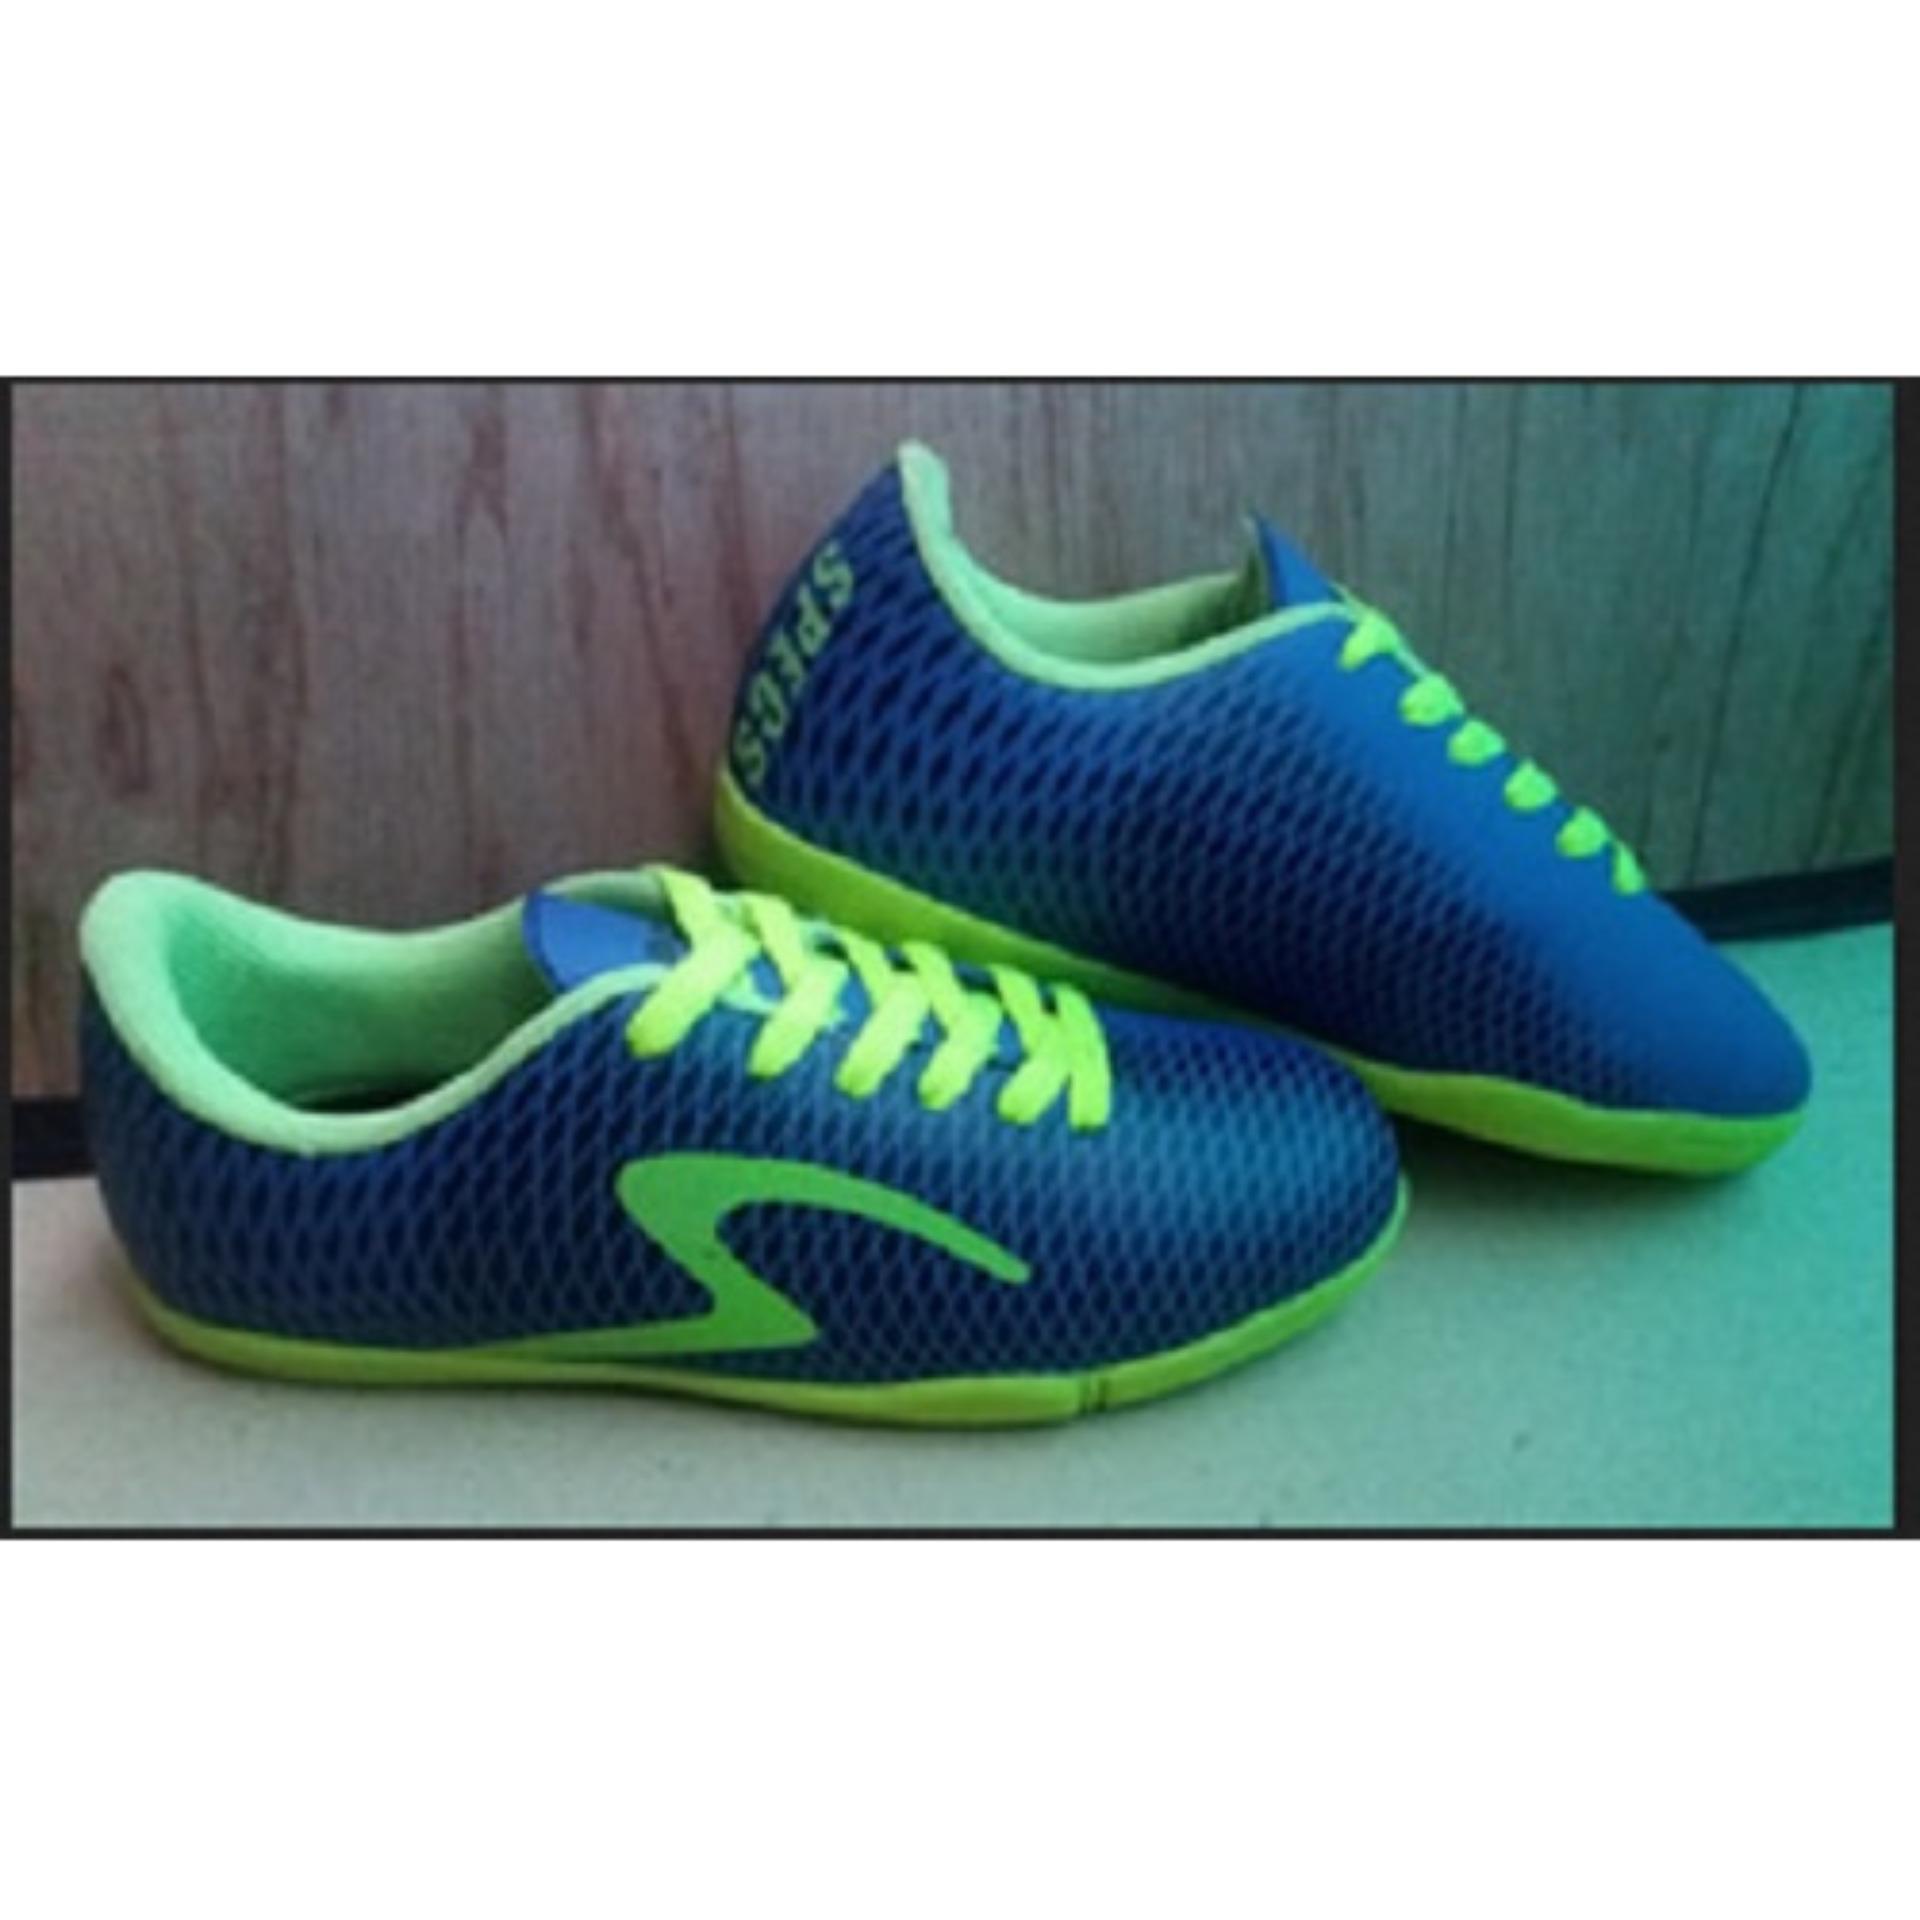 fortuner shop sepatu futsal keren murahIDR124990. Rp 129.000